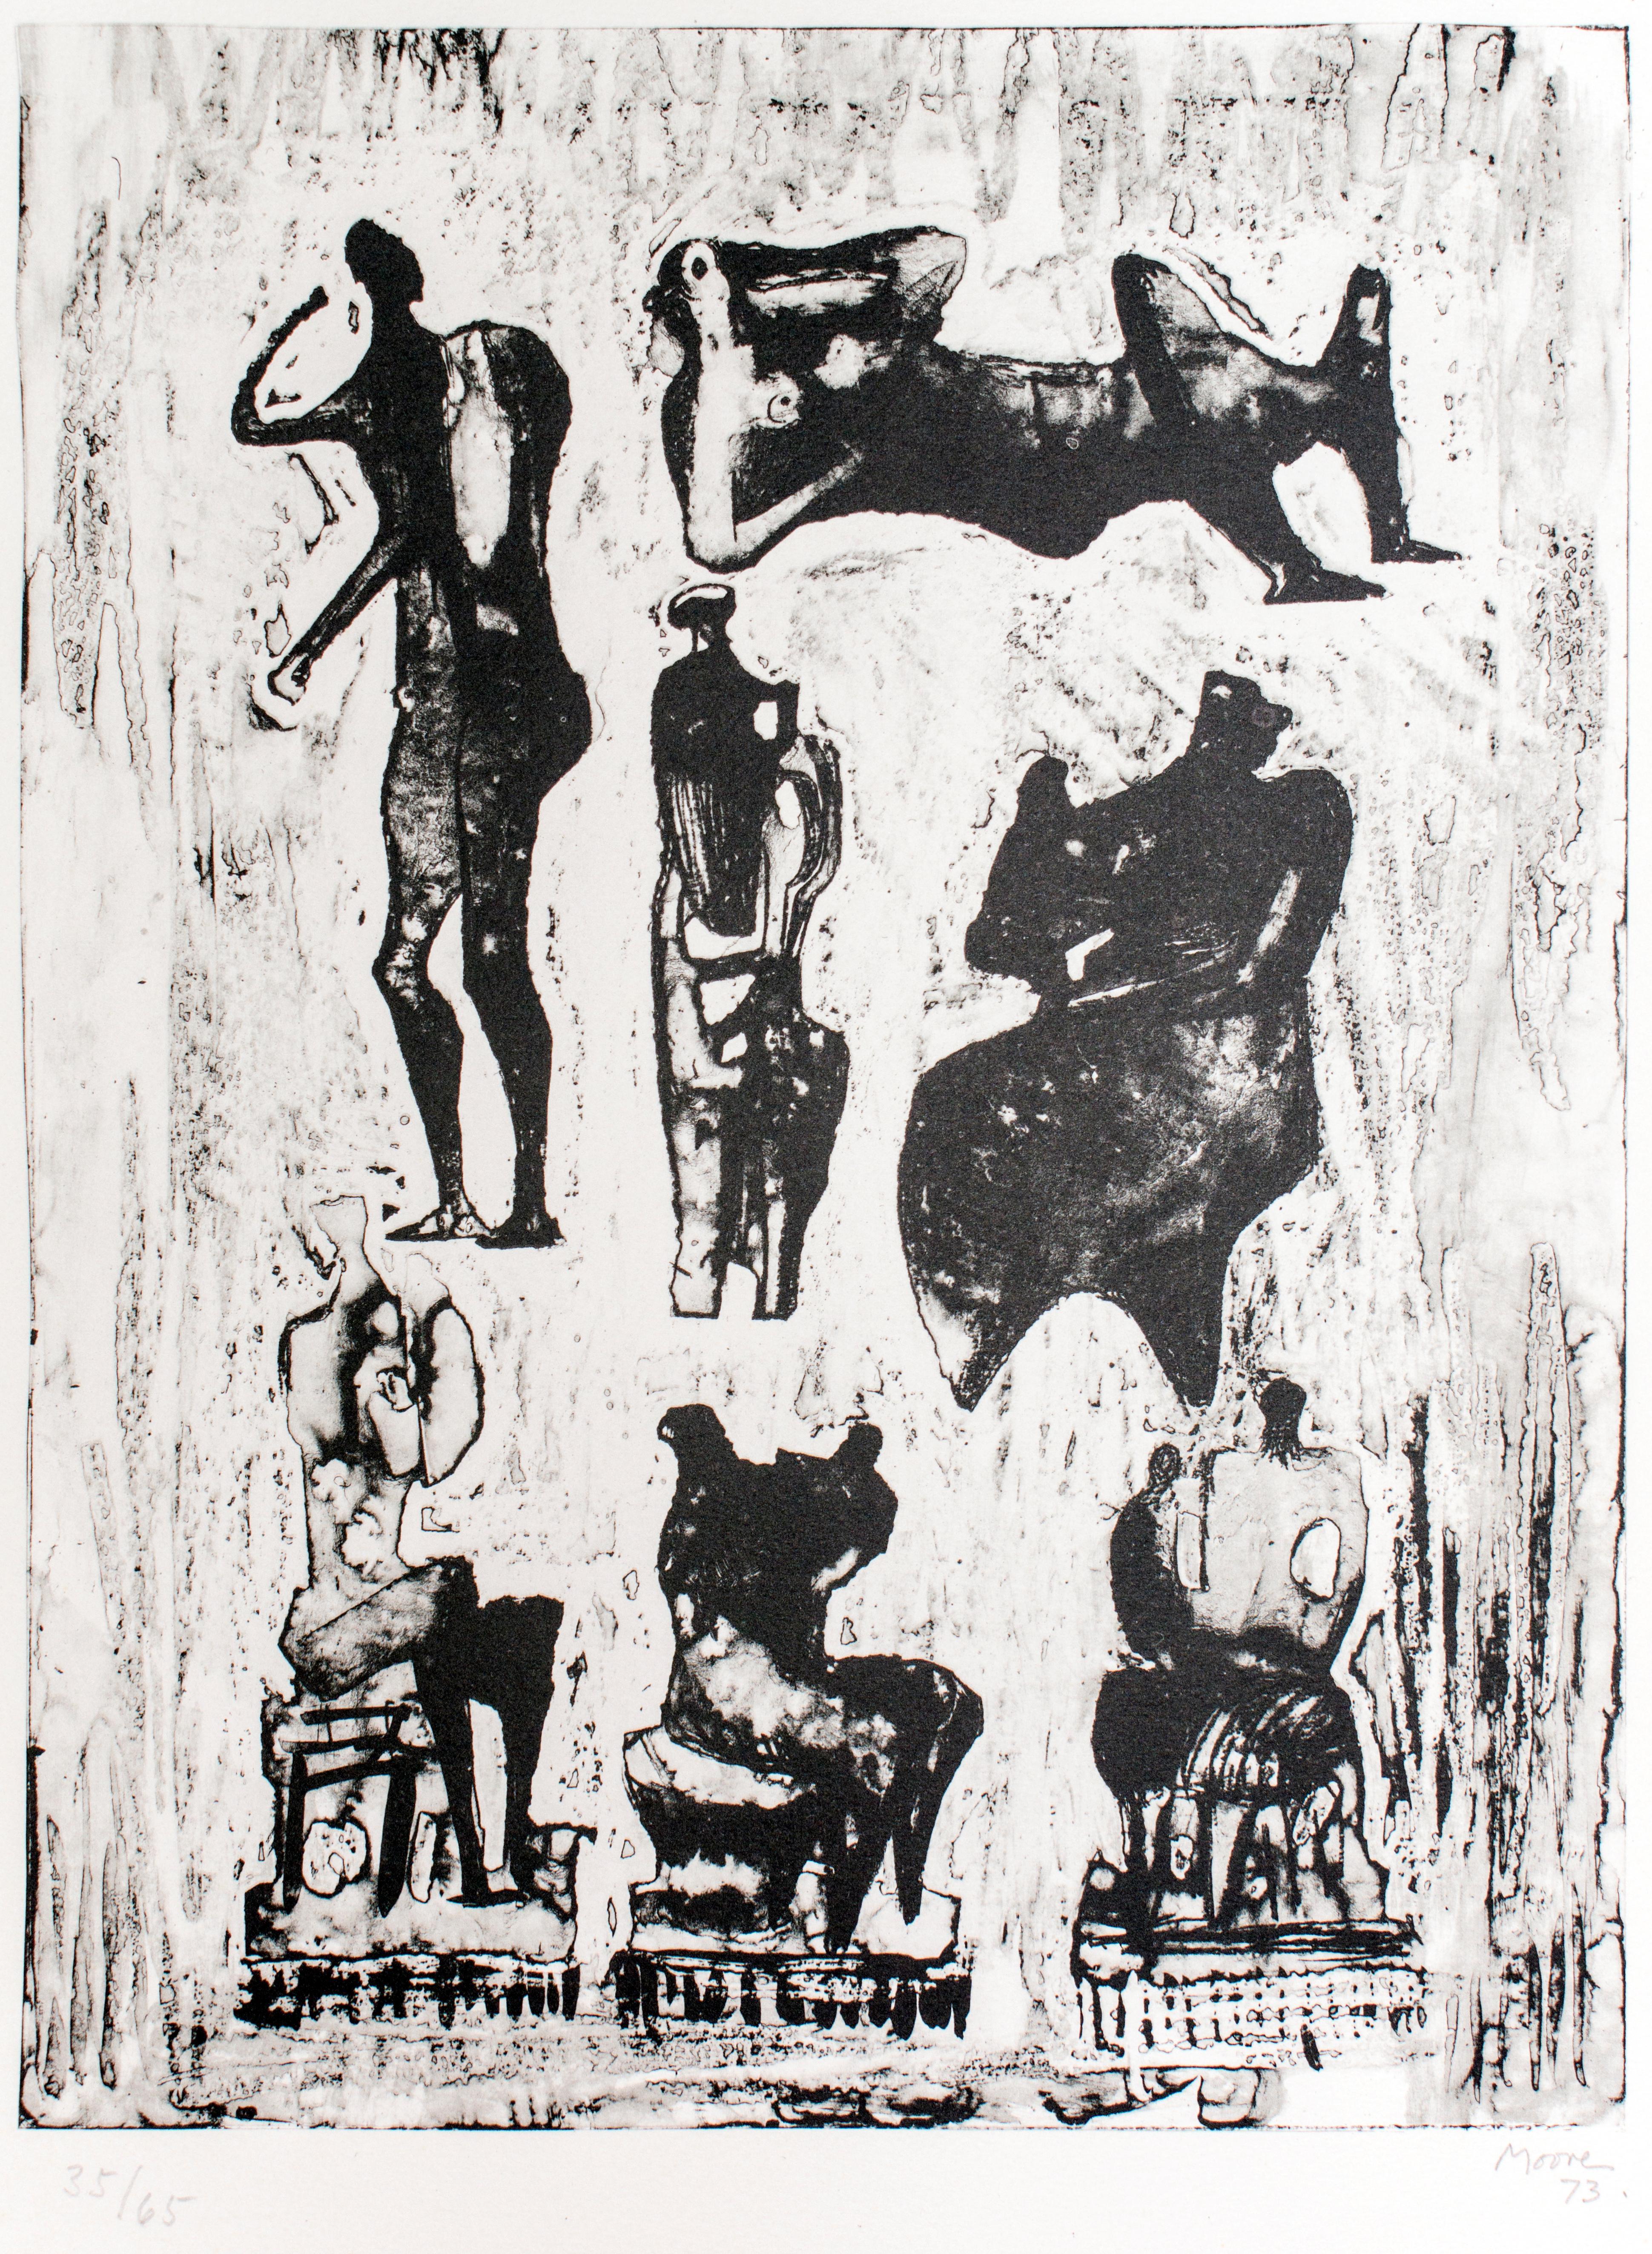 Seven Sculptural Ideas - 1970s - Henry Moore - Lithograph - Contemporary